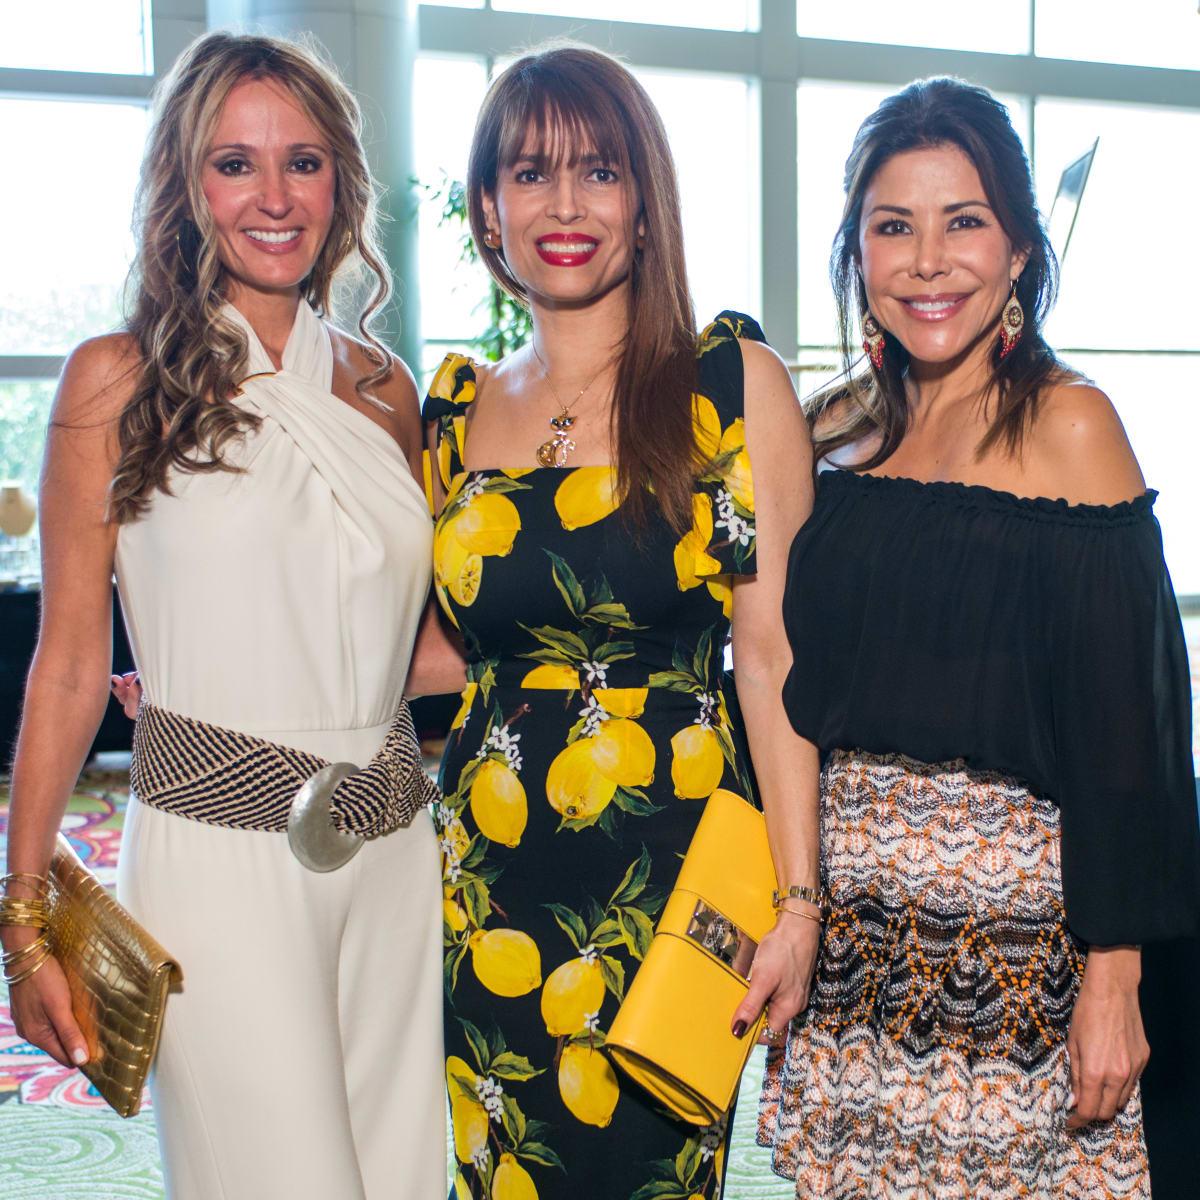 Latin Women's Initiative luncheon 5/16, Cindy Garza, Karina Barbieri, Ericka Bagwell